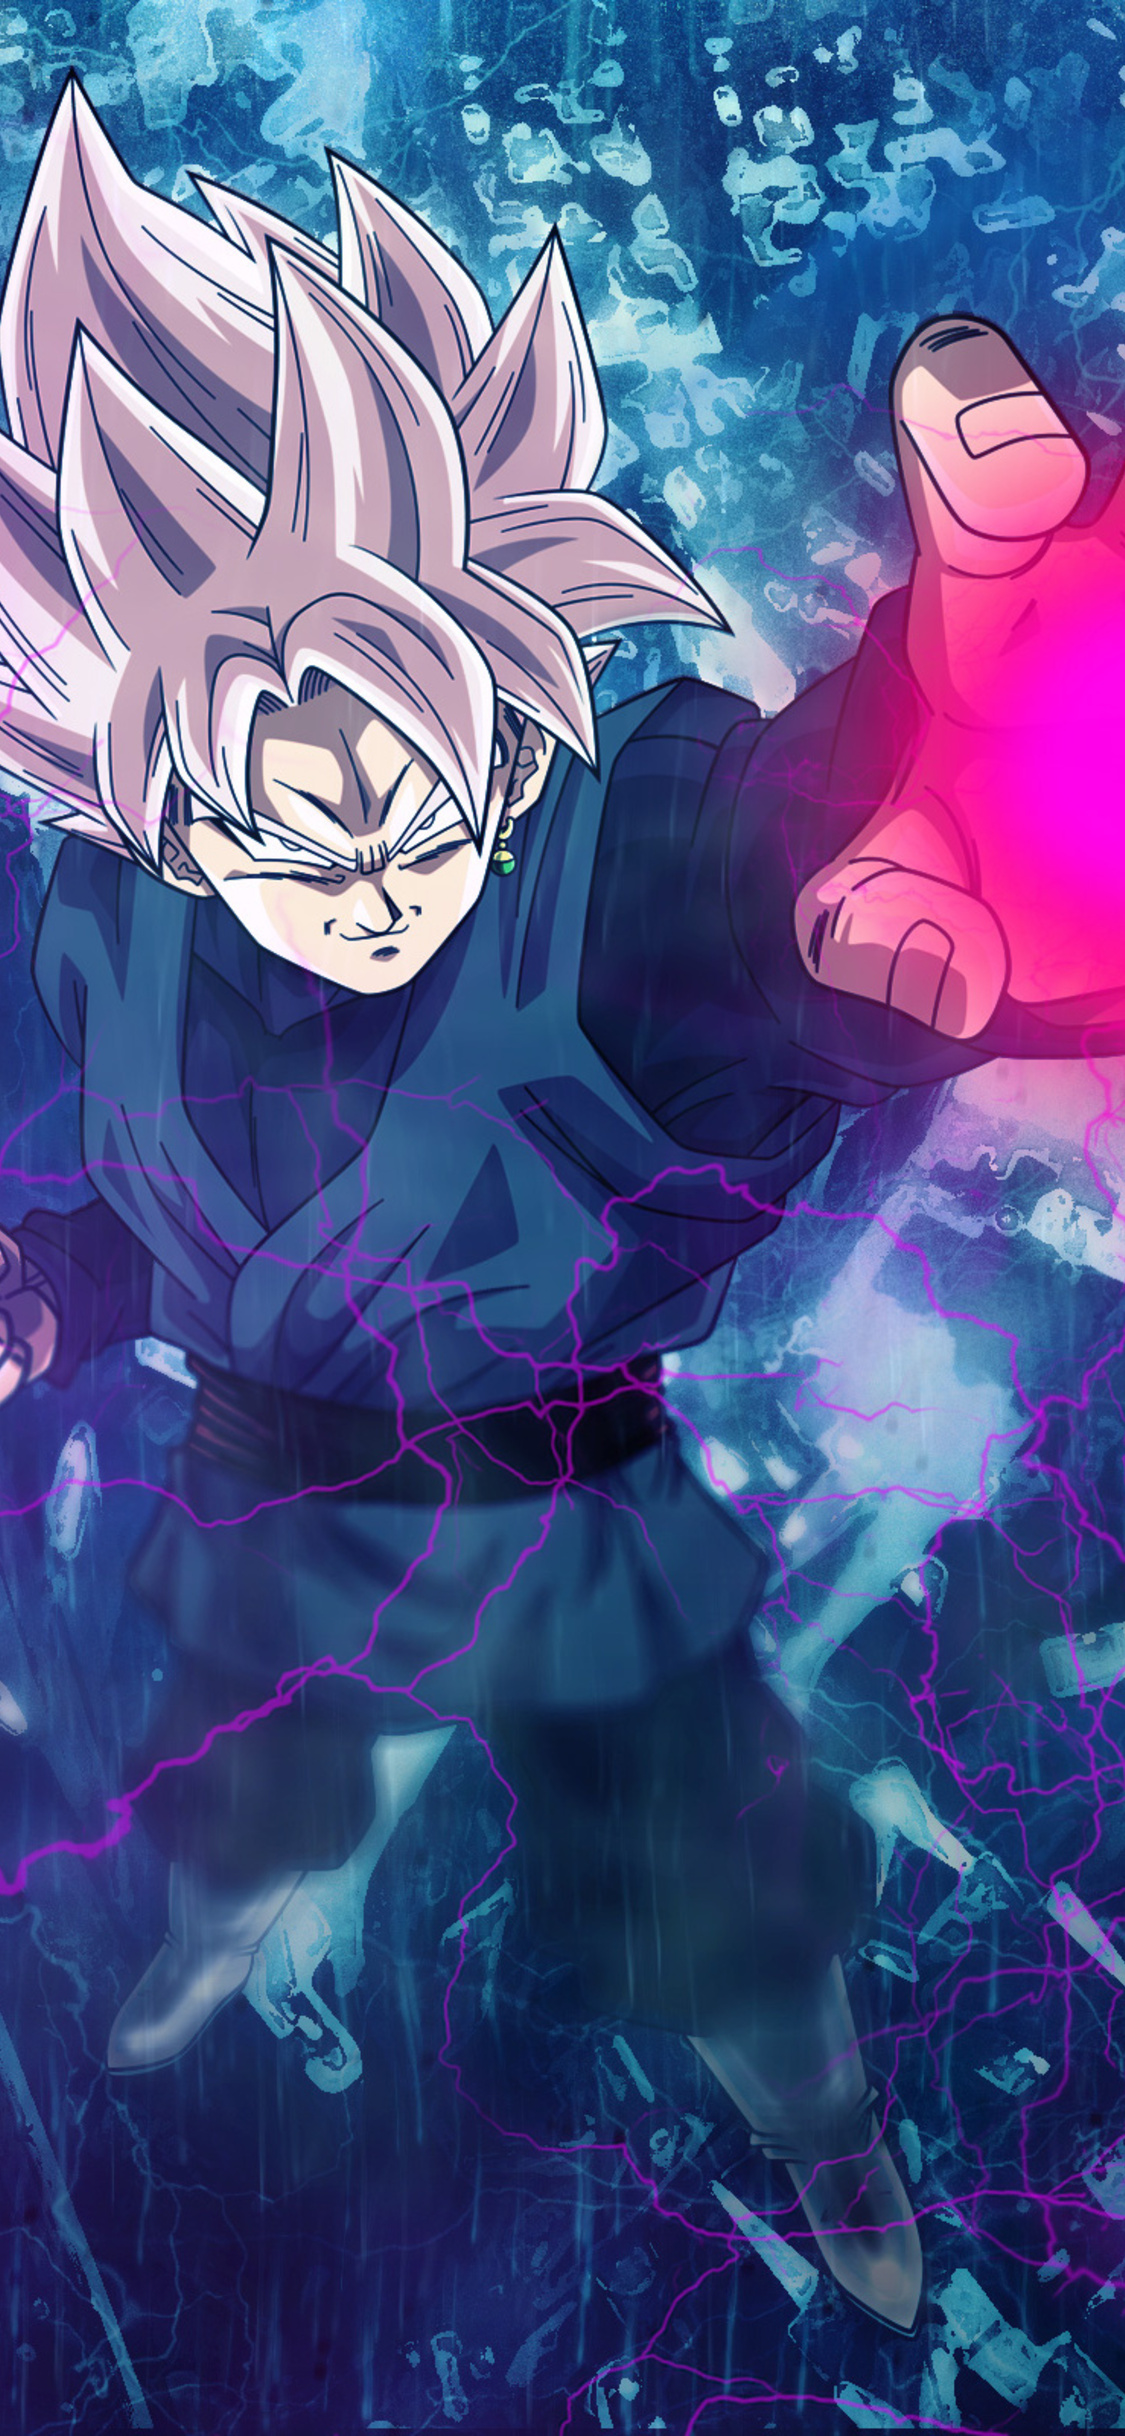 1125x2436 Black Goku Iphone XS,Iphone 10,Iphone X HD 4k Wallpapers, Images, Backgrounds, Photos